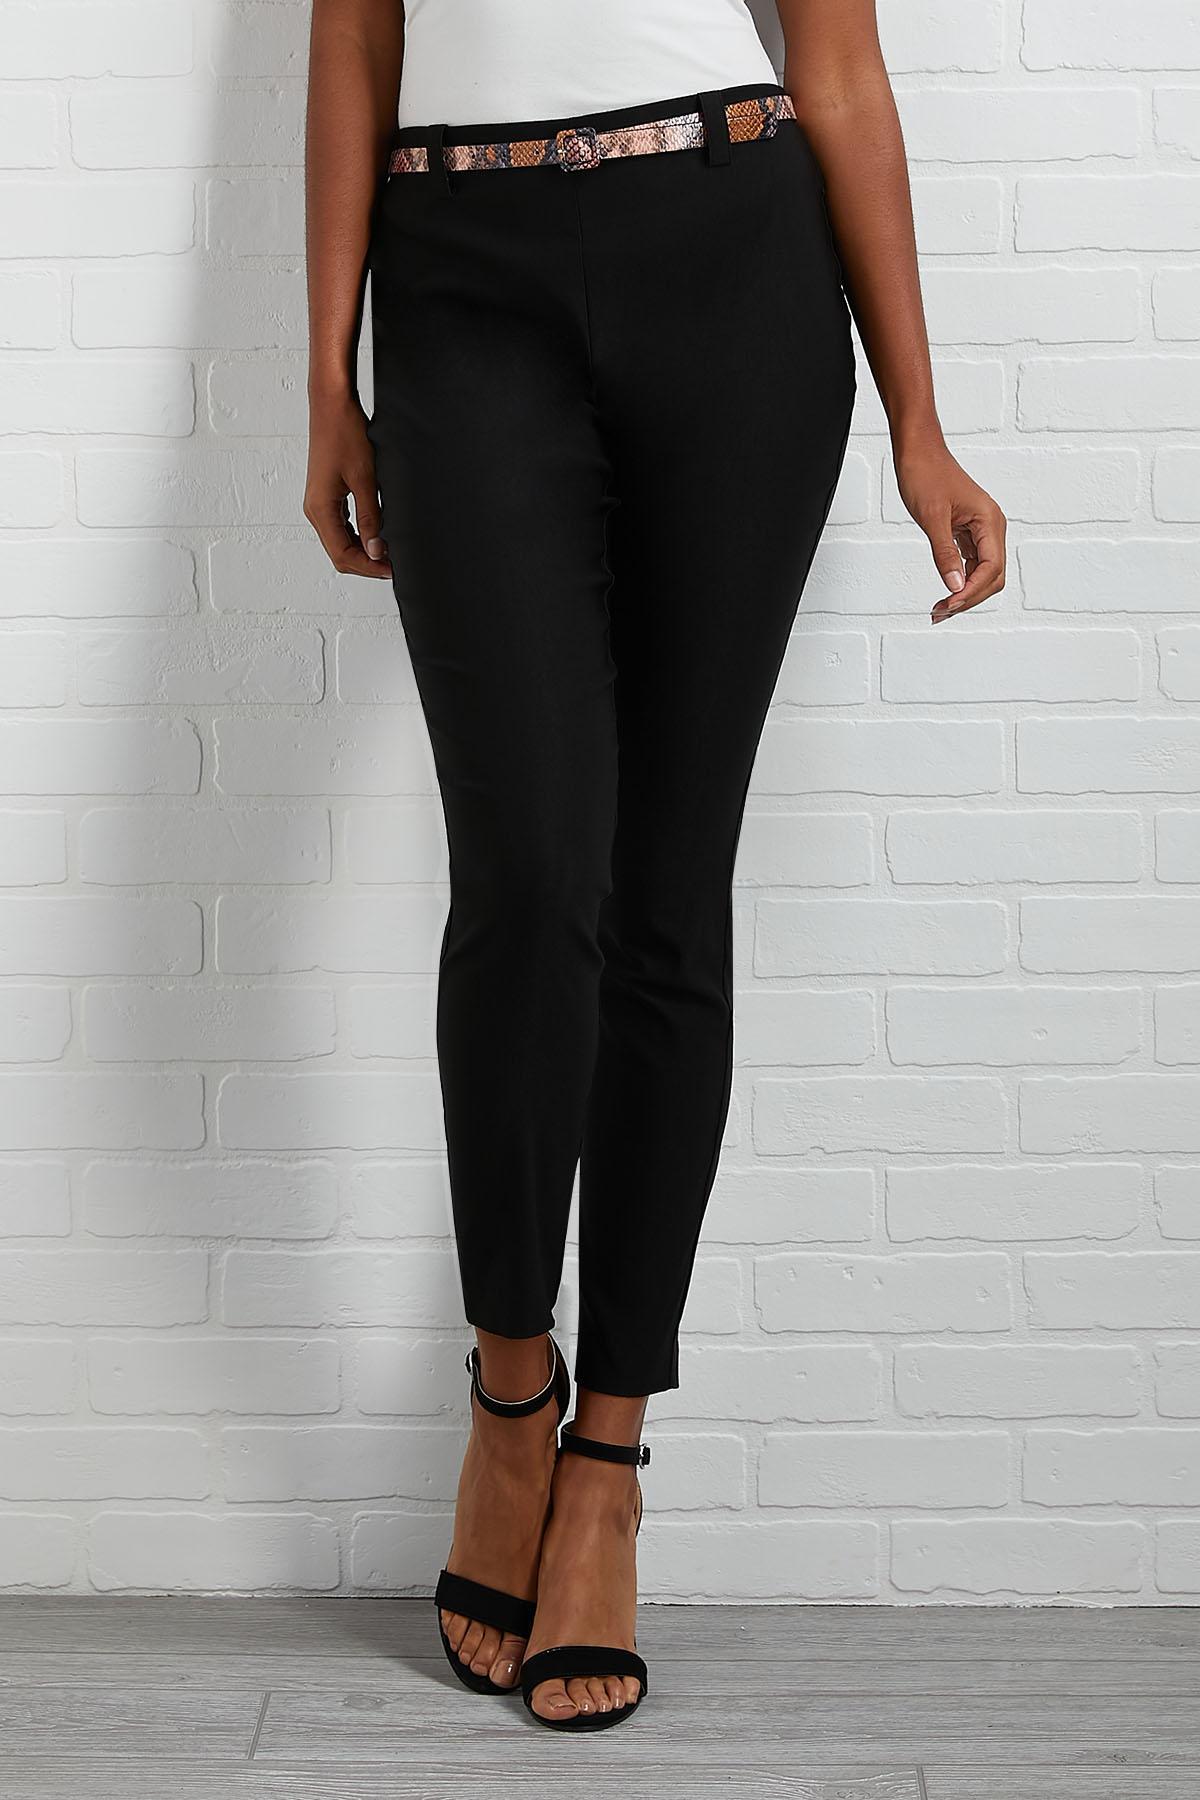 A Hint Of Print Black Pants